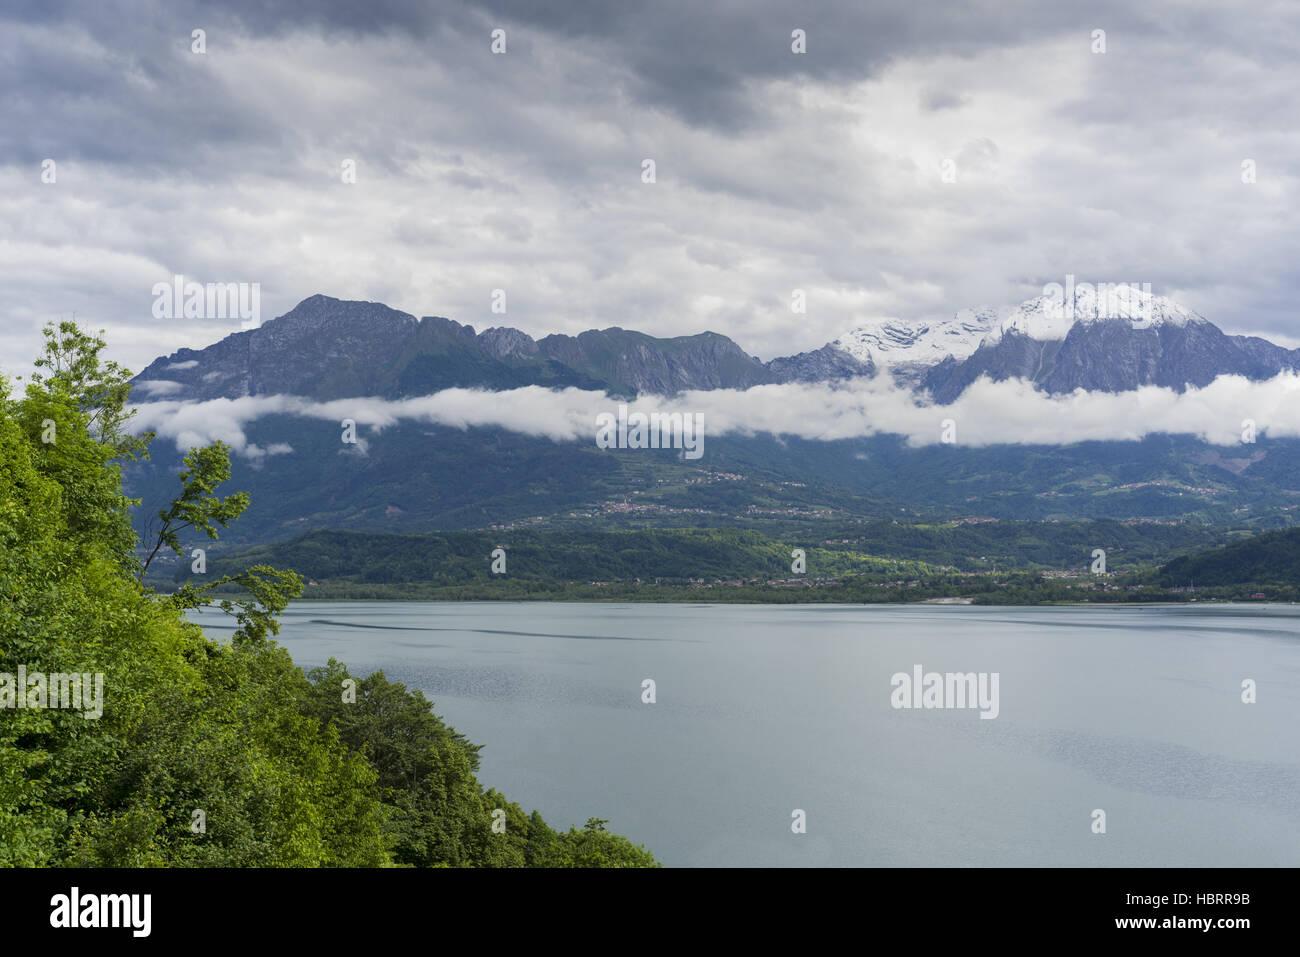 Alpine lake of Santa Croce (Belluno, Italy) - Stock Image